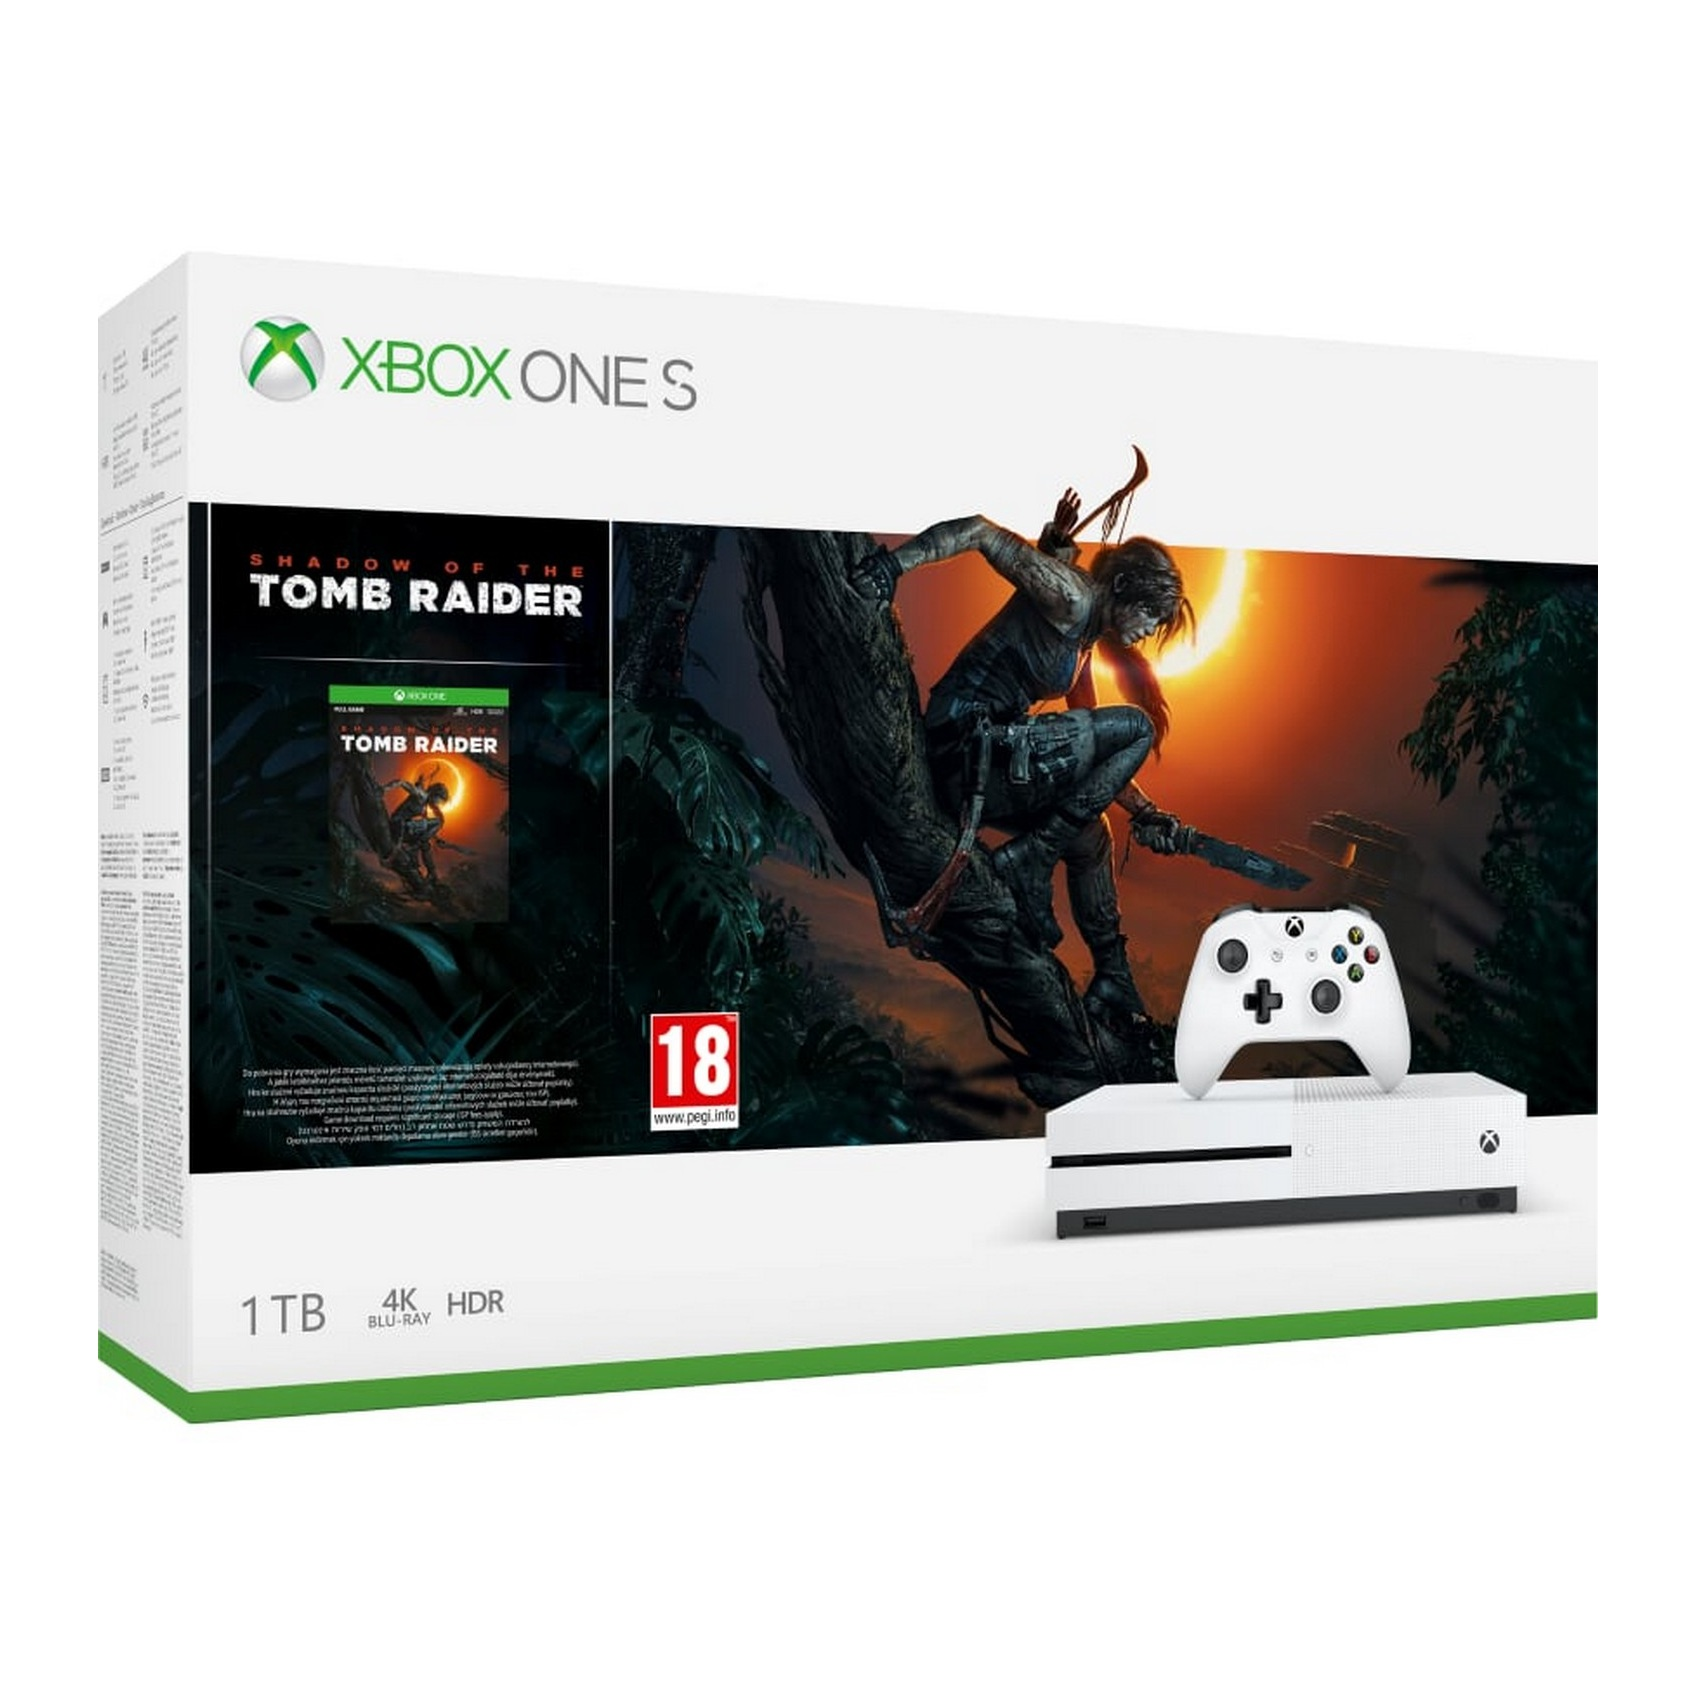 Microsoft Xbox One S 1TB Shadow of the Tomb Raider Bundle